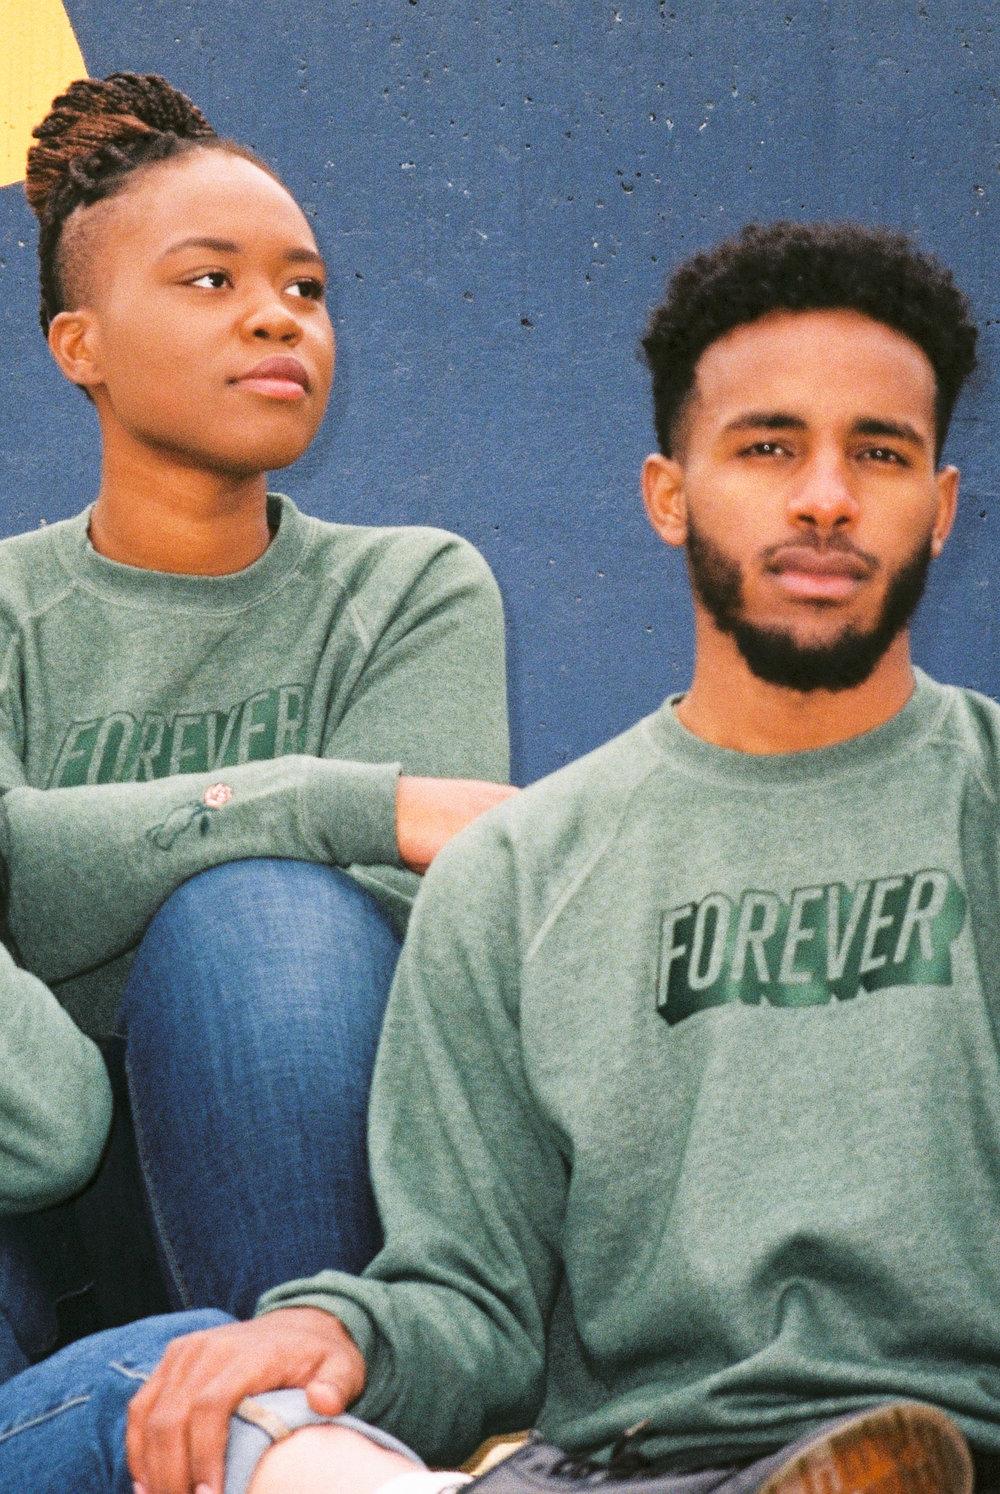 joyce.is-forever-sweatshirt-x-nylonsaddle-73.jpg